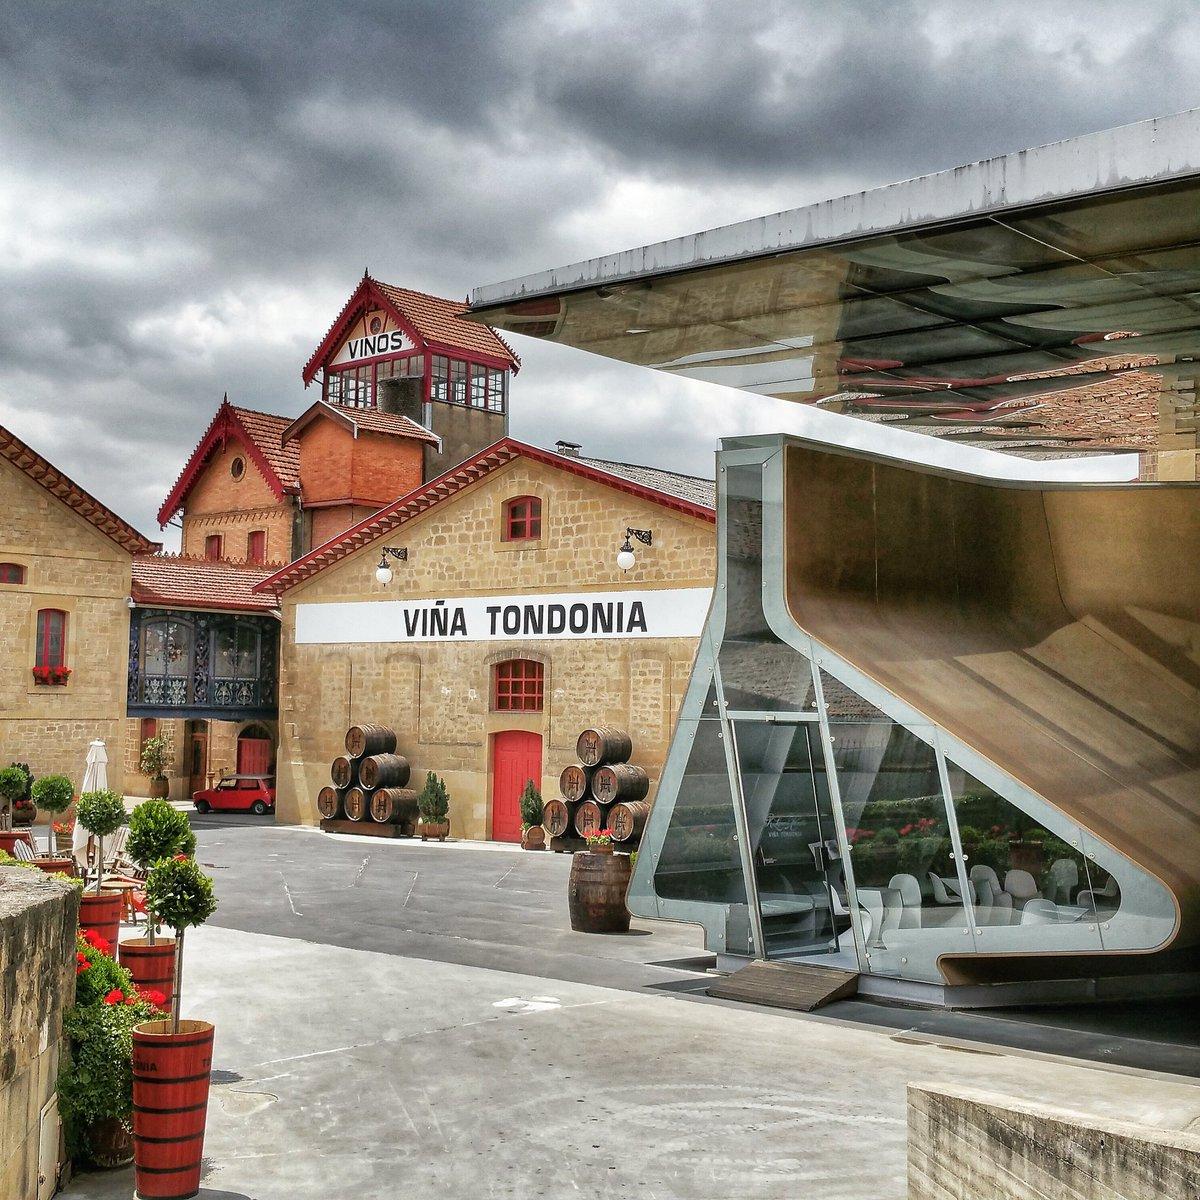 Zaha Hadid 1950-2016 Always we'll have a remember in Rioja #wine #viñatondonia #winelover #winetours https://t.co/3F820MPnjc